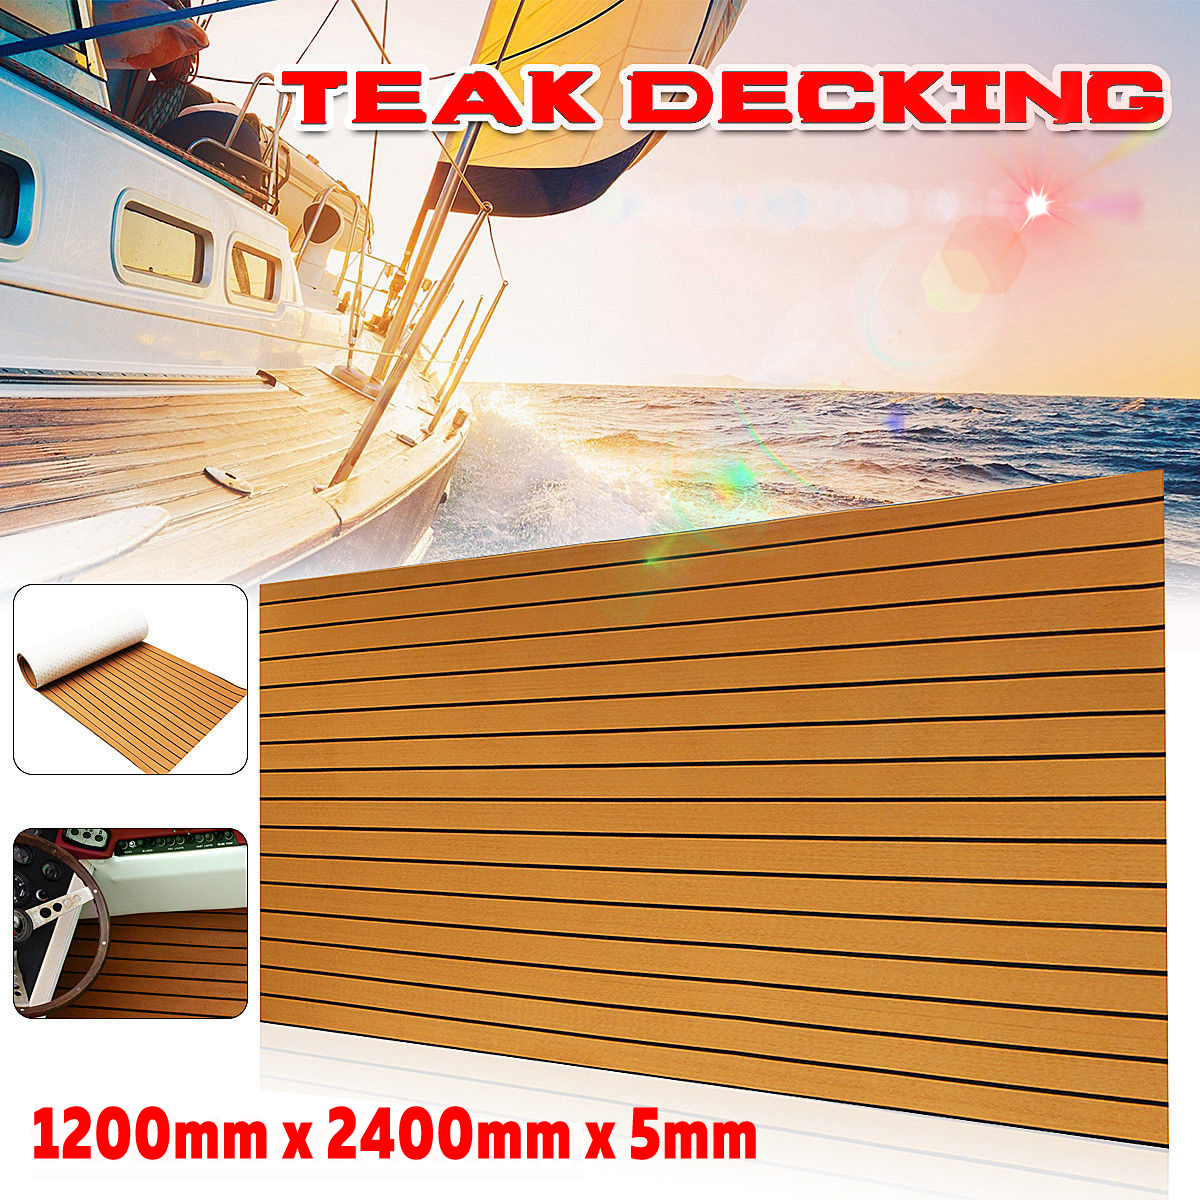 1200x2400mm 5mm Self Adhesive EVA Foam Faux Teak Sheet Boat Yacht Synthetic Teak Decking Floor Mat Brown|RV Parts & Accessories| |  - title=